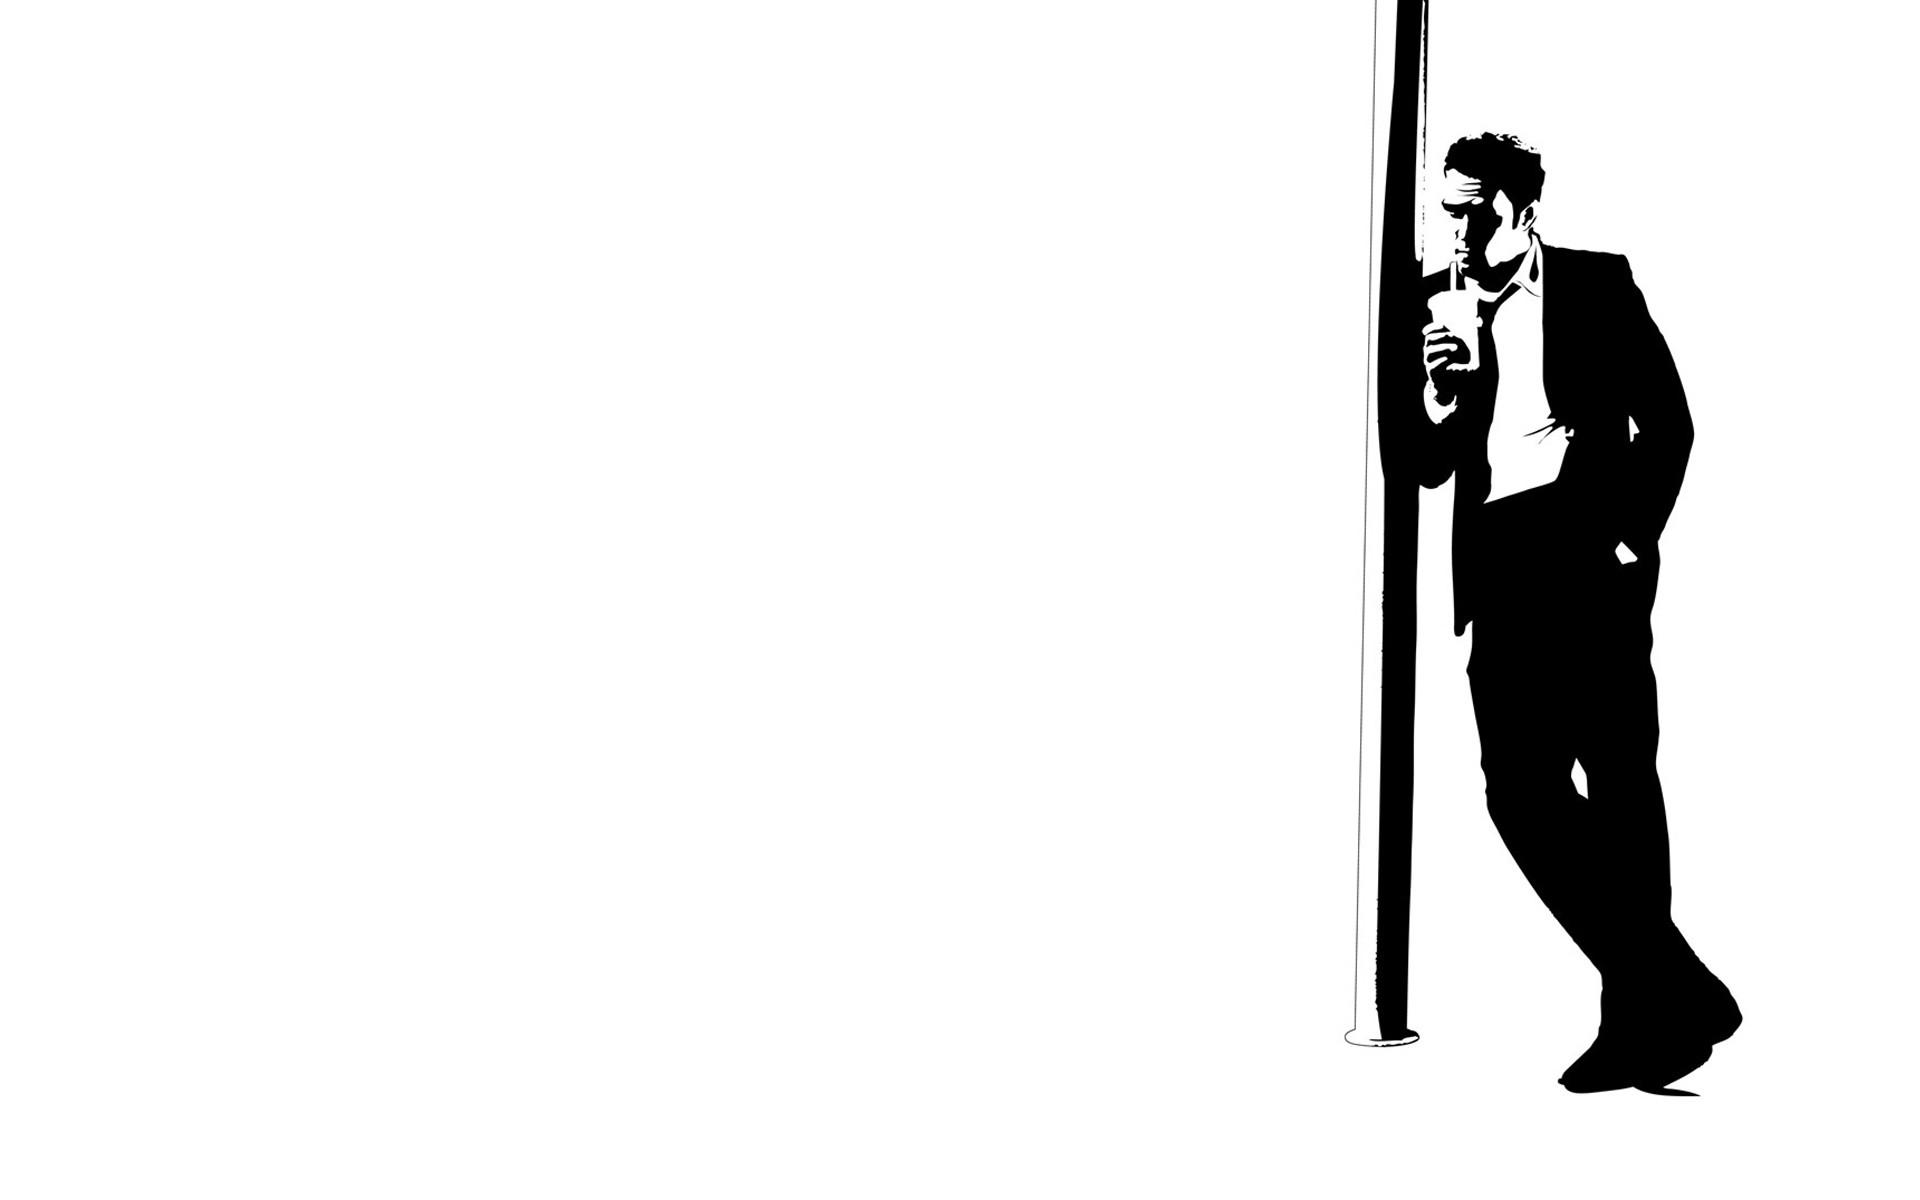 Mr Blonde at post 1992 resolution. (Reservoir Dogs) [1920×1200] …